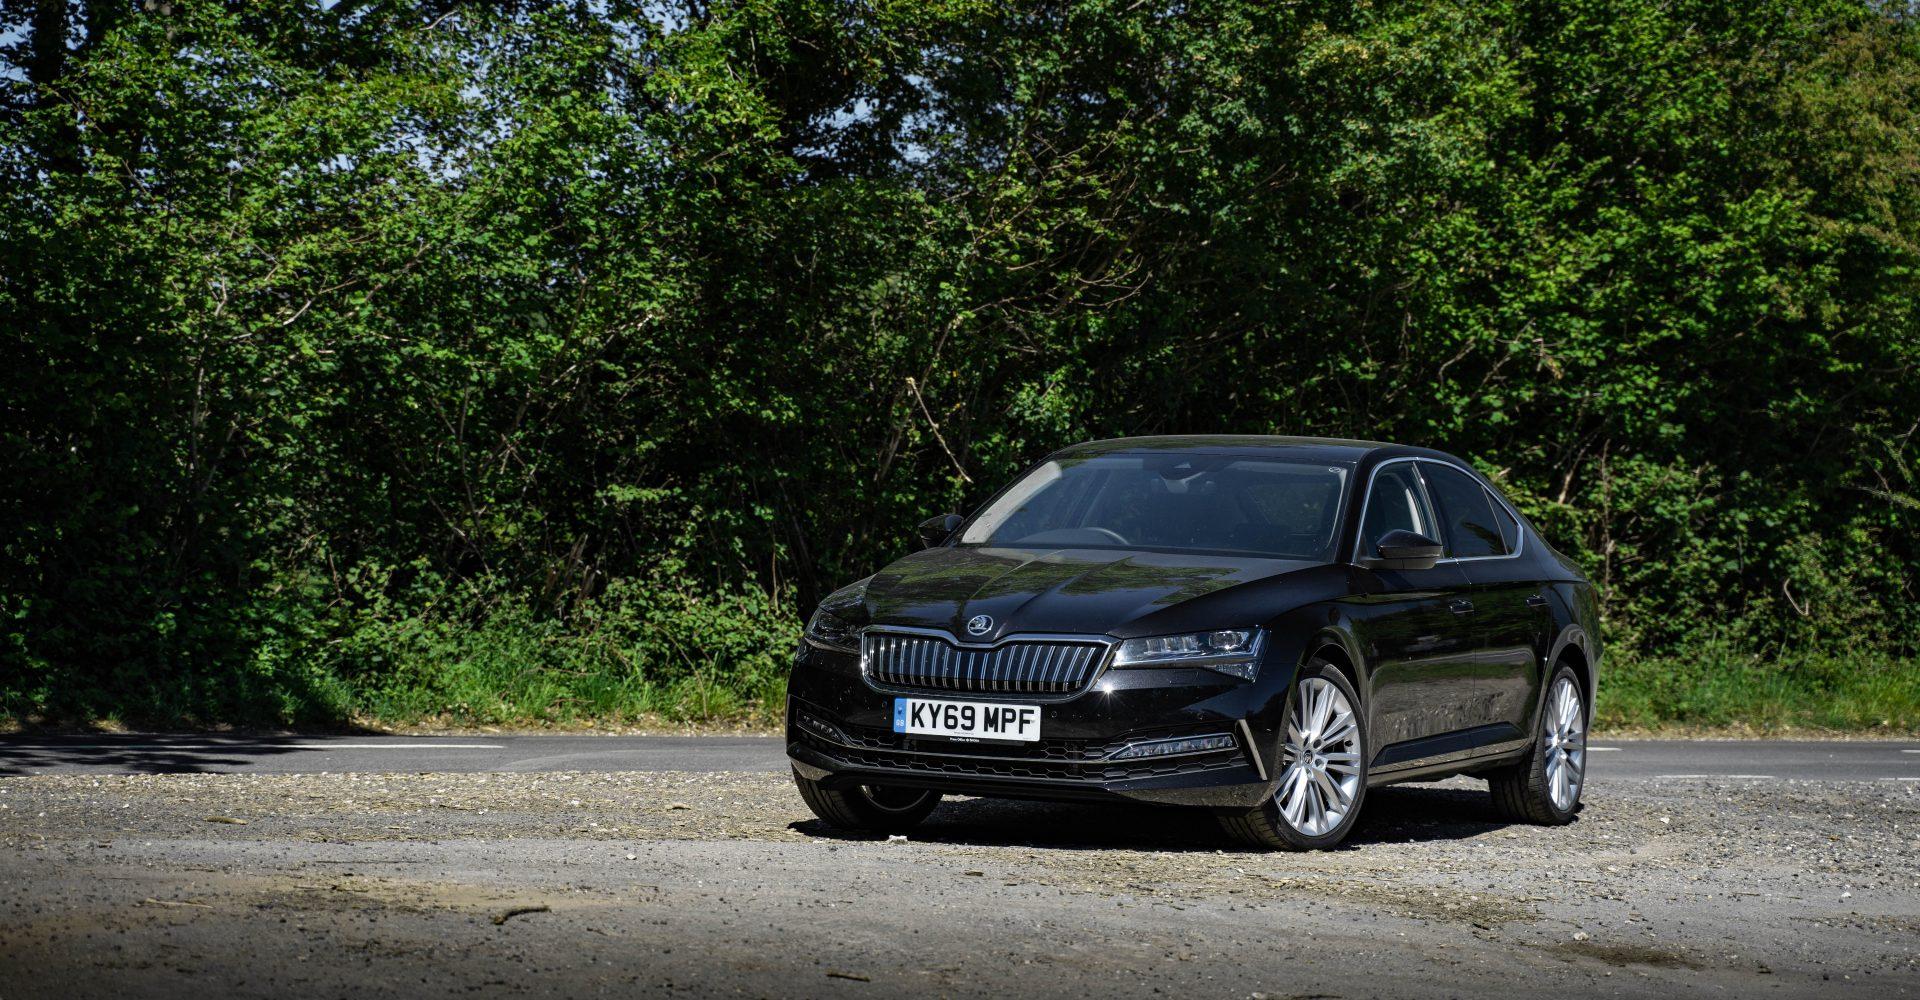 UK Drive: The Skoda Superb iV brings wafty frugality to the executive segment